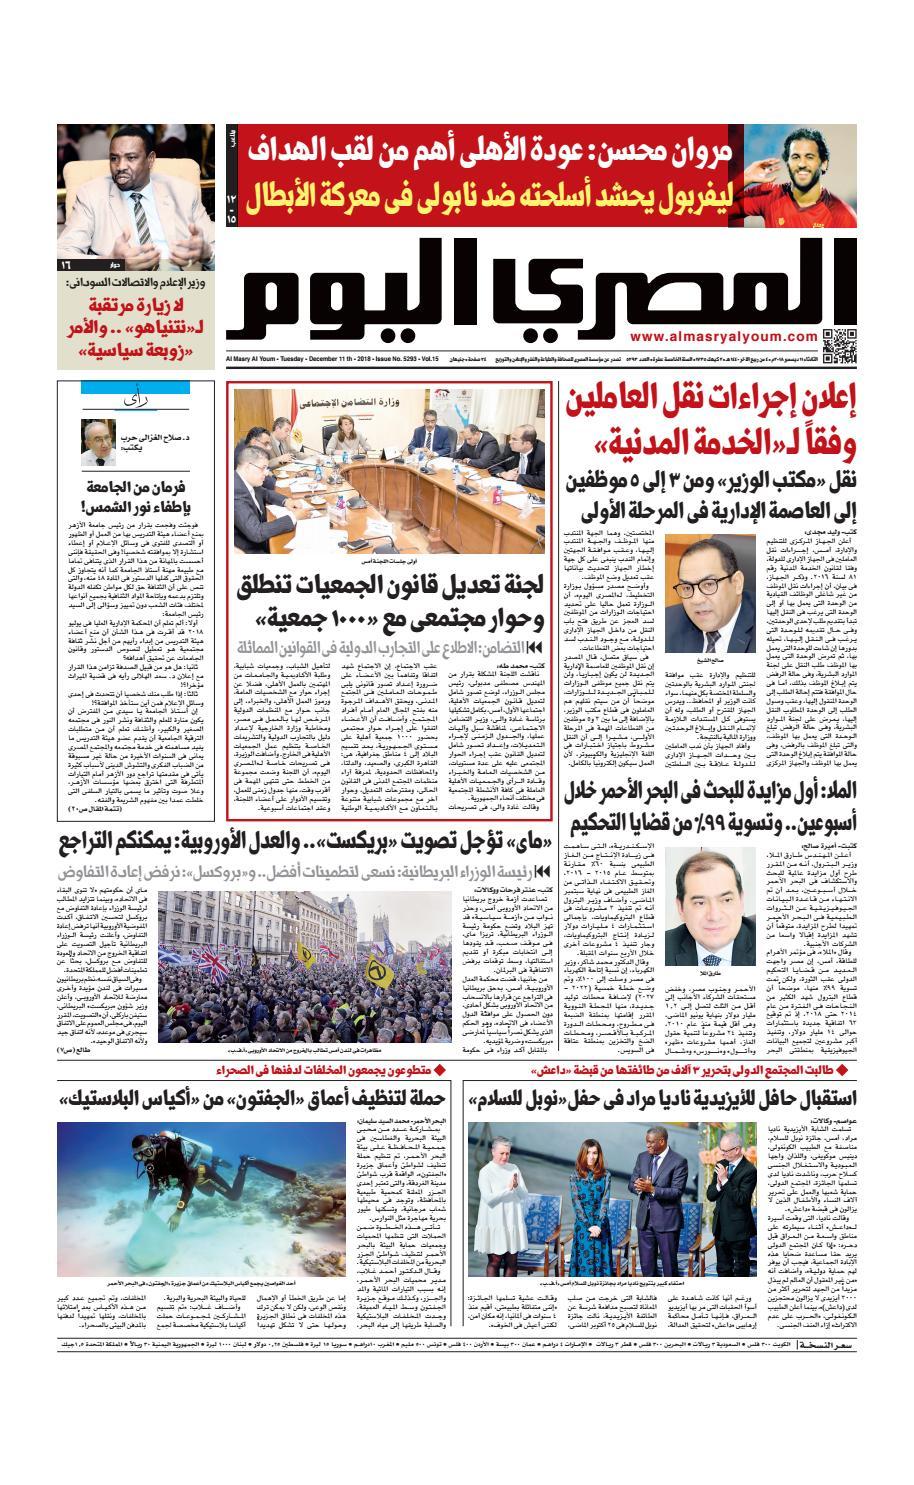 dfc22e8b6 عدد الثلاثاء 11-12-2018 by Al Masry Media Corp - issuu